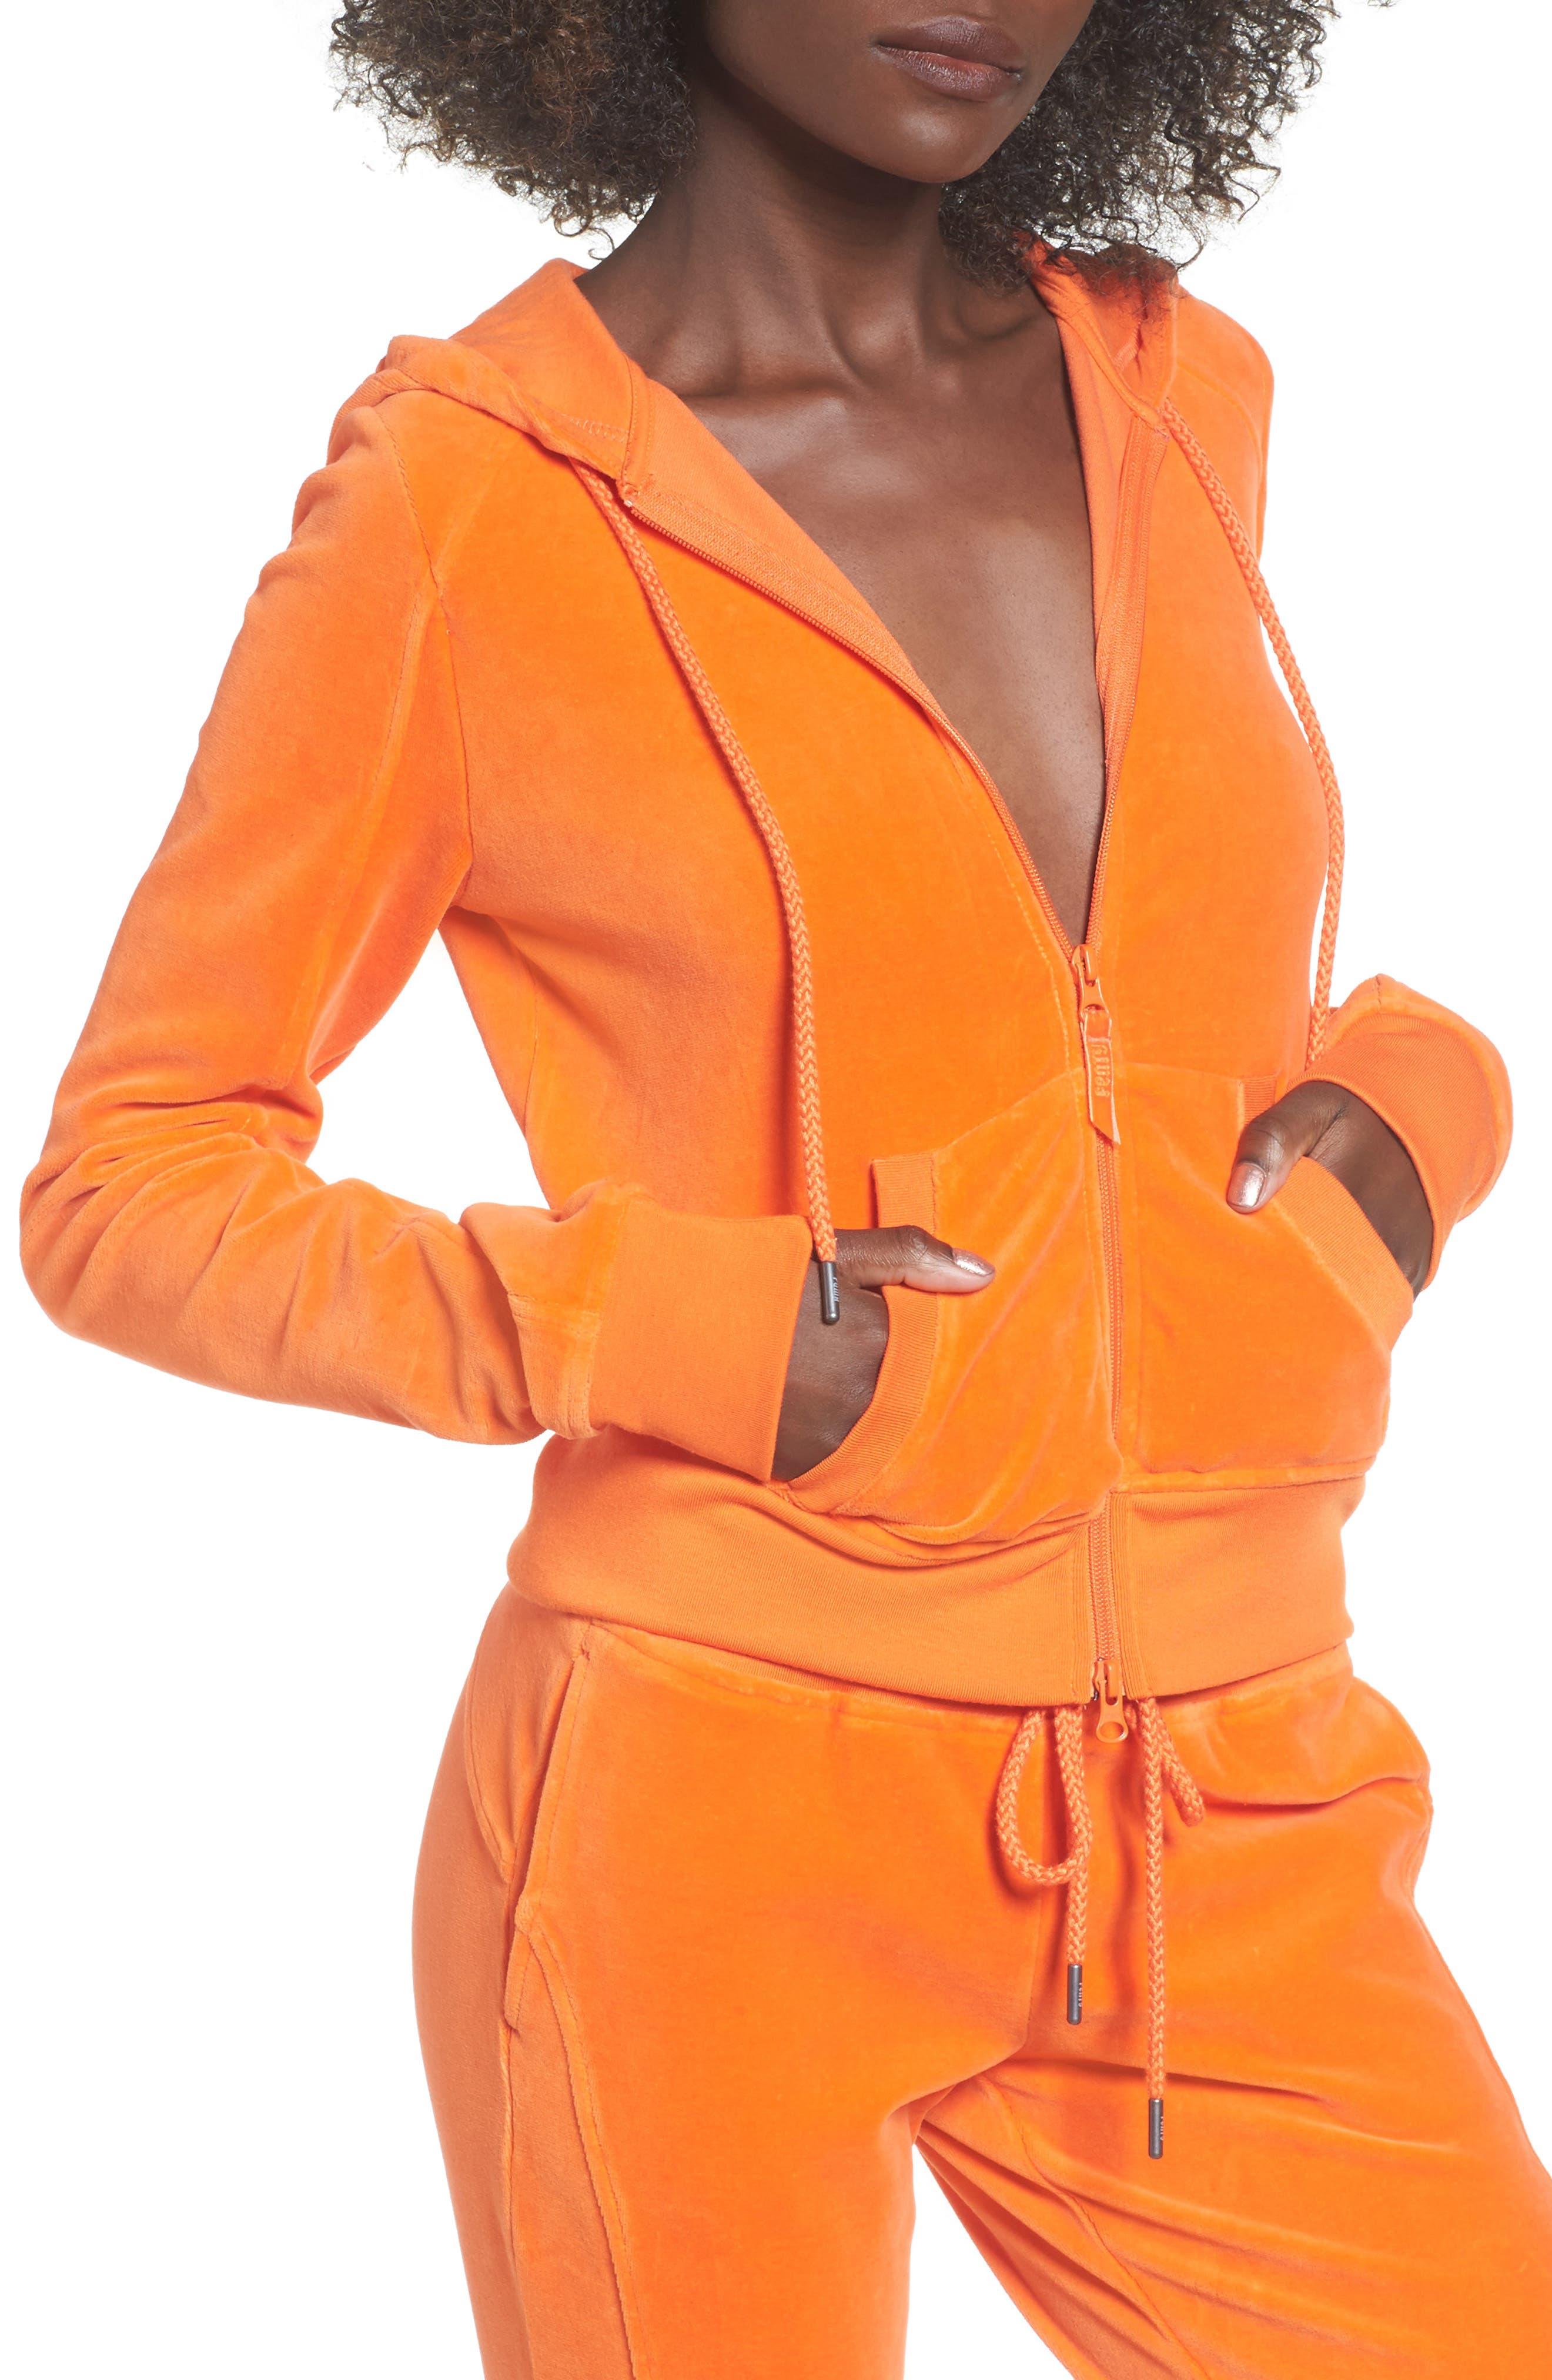 FENTY PUMA by Rihanna Velour Zip Hoodie